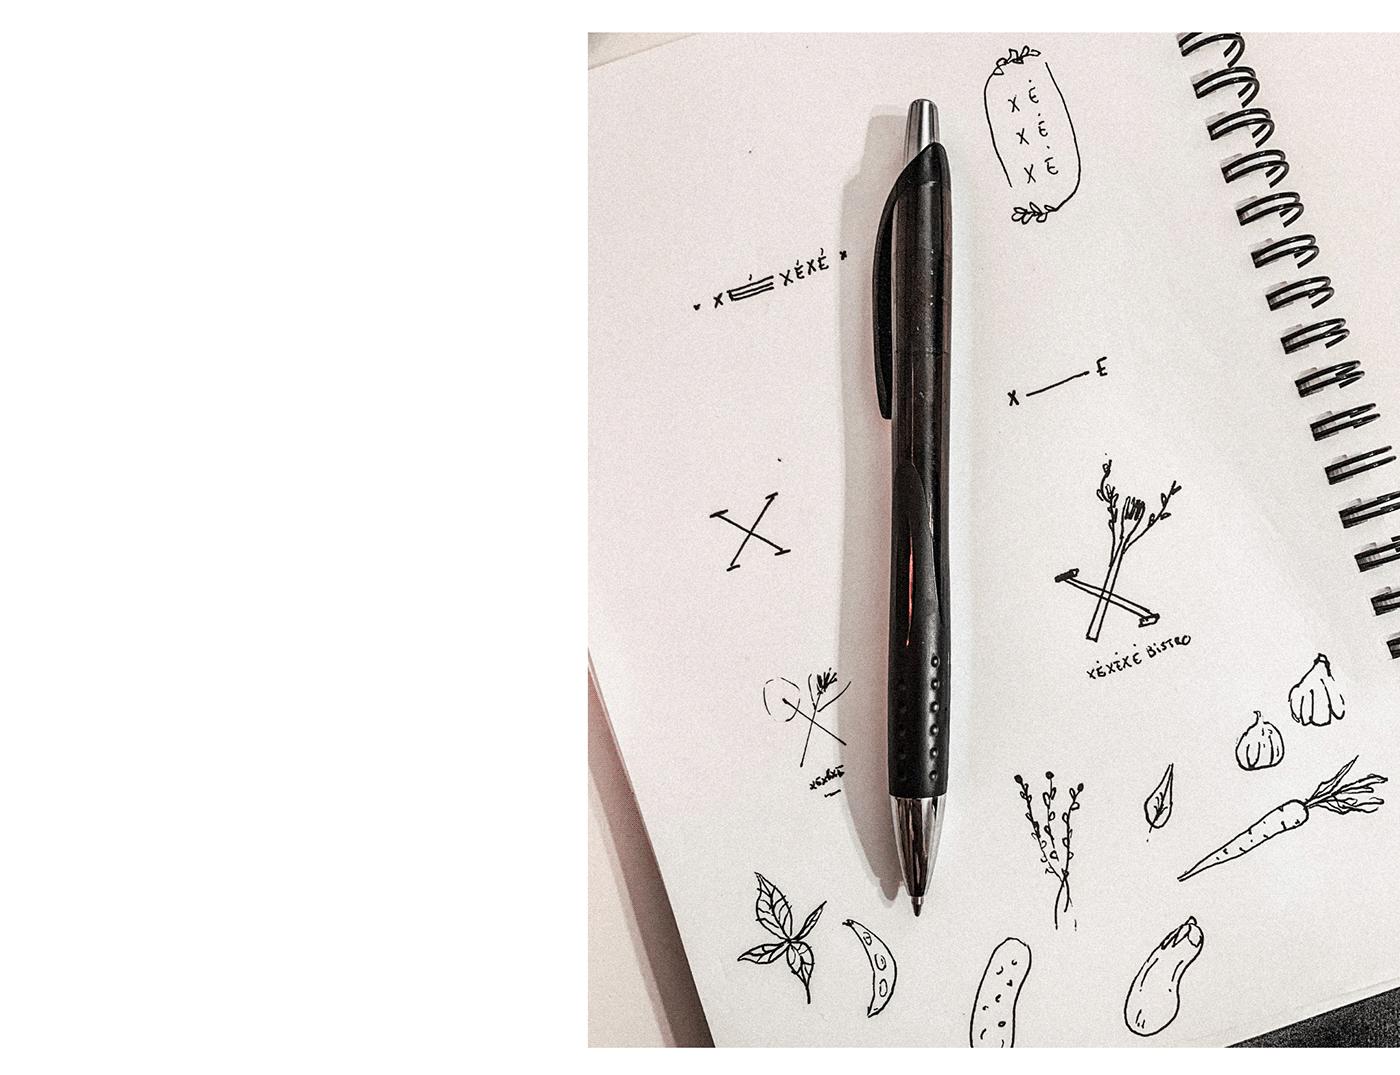 Image may contain: handwriting, sketch and drawing